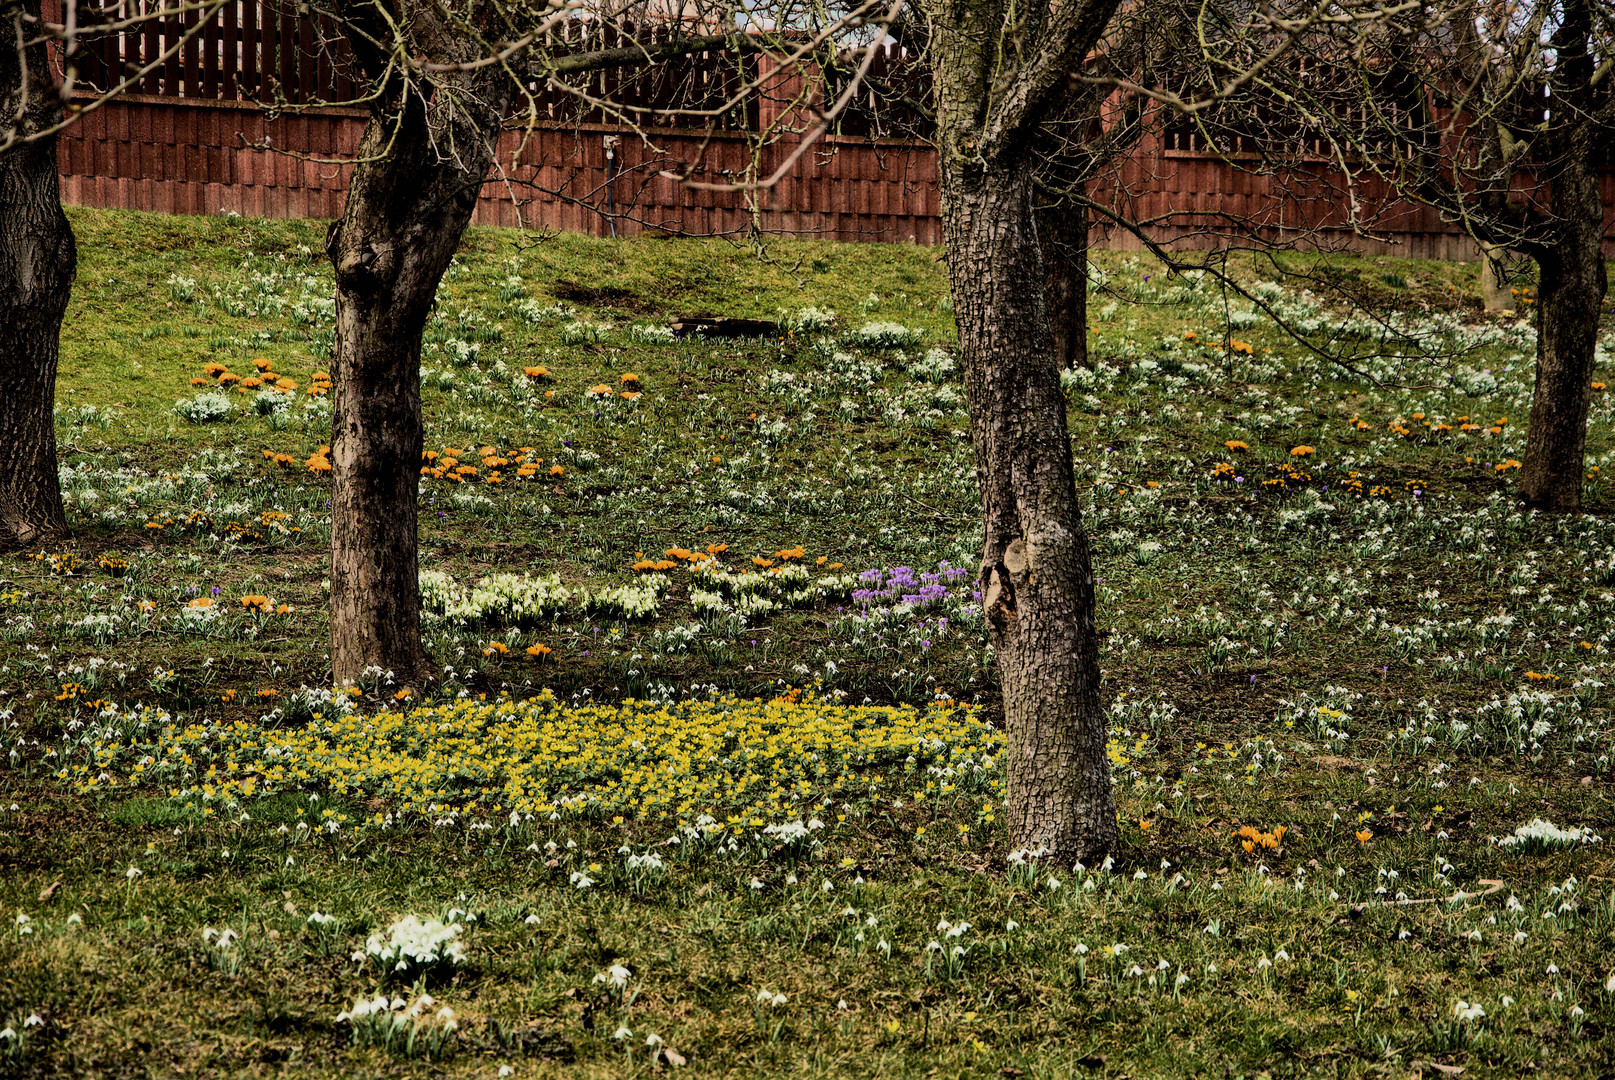 Über Nacht kam der Frühling! .....Nr. 4